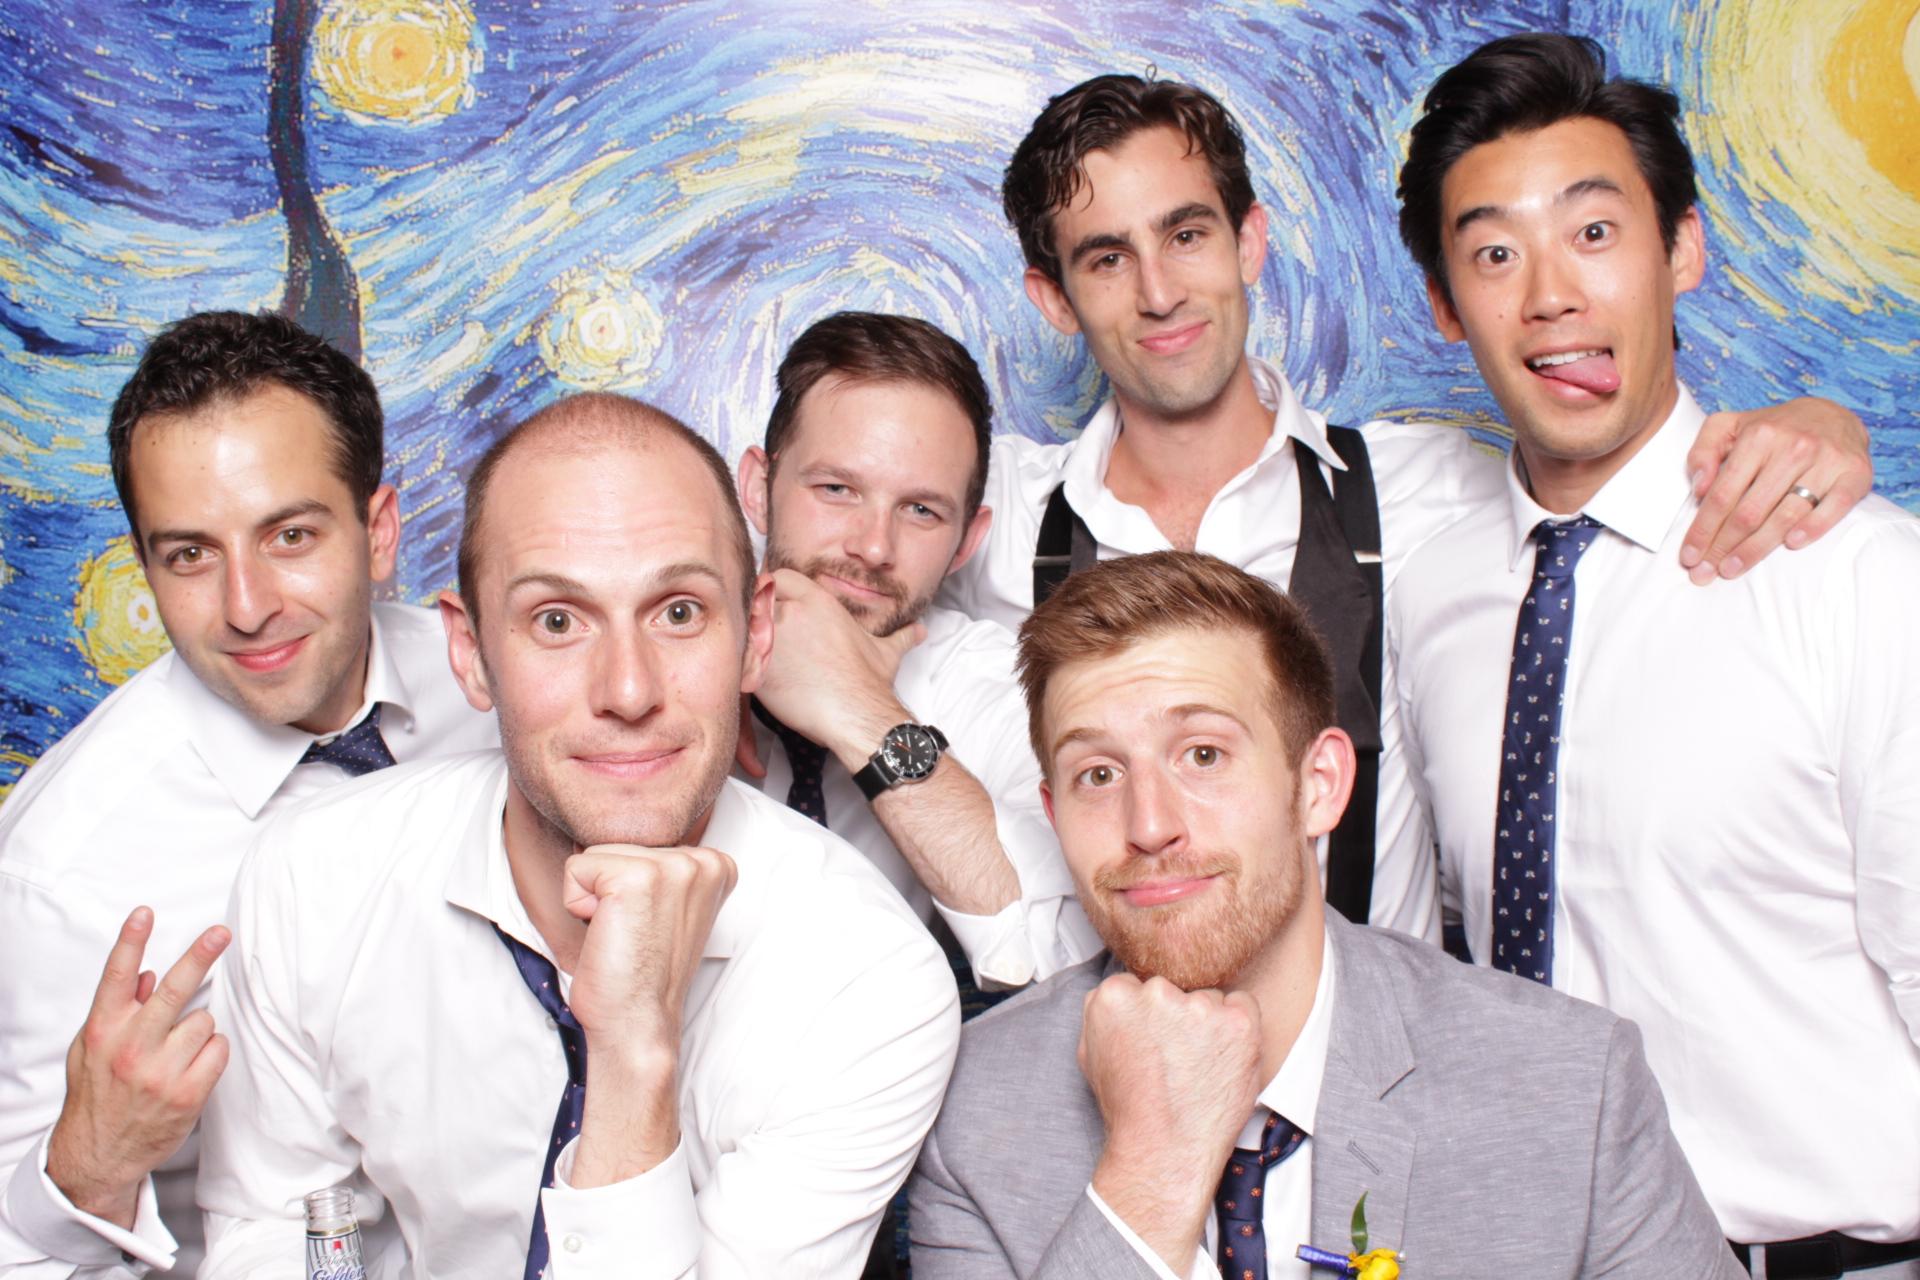 _Minneapolis_aria_Wedding_photo_booth_rental (10).jpg